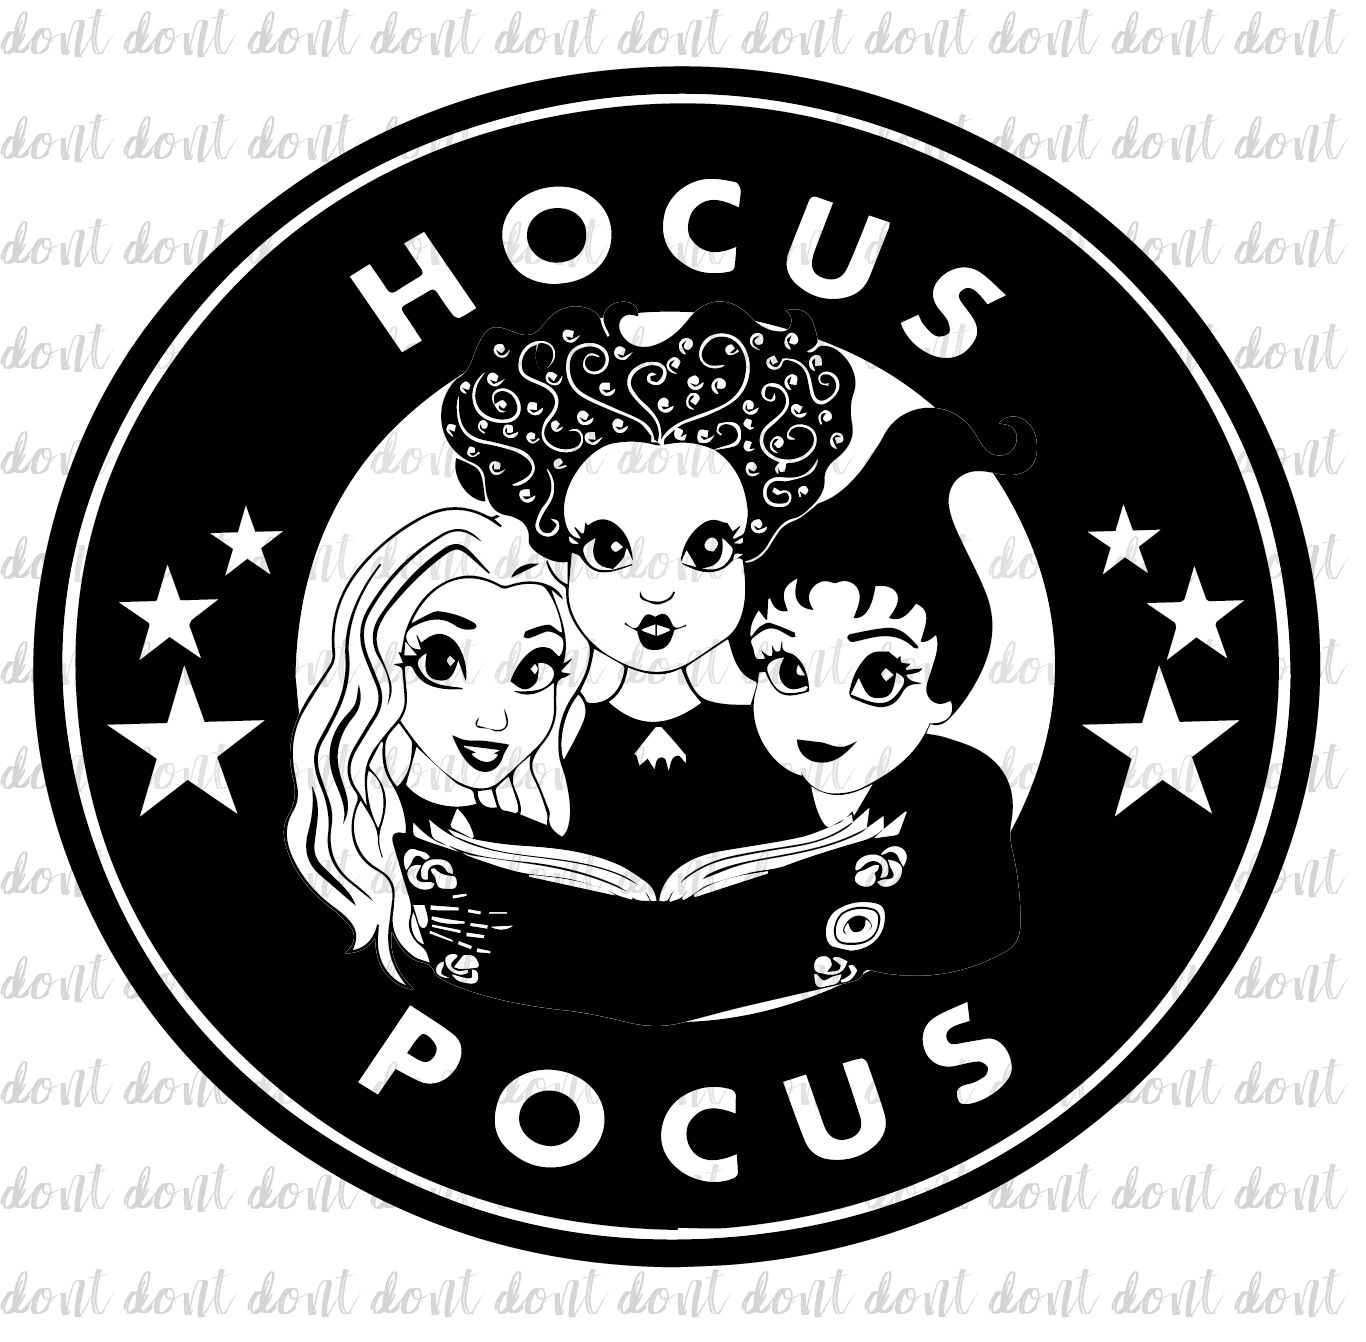 Hocus Pocus Png Hocus Pocus Starbucks Png Halloween Sublimation Sanderson Sisters Png Not Your B Starbucks Halloween Cricut Halloween Cricut Projects Vinyl